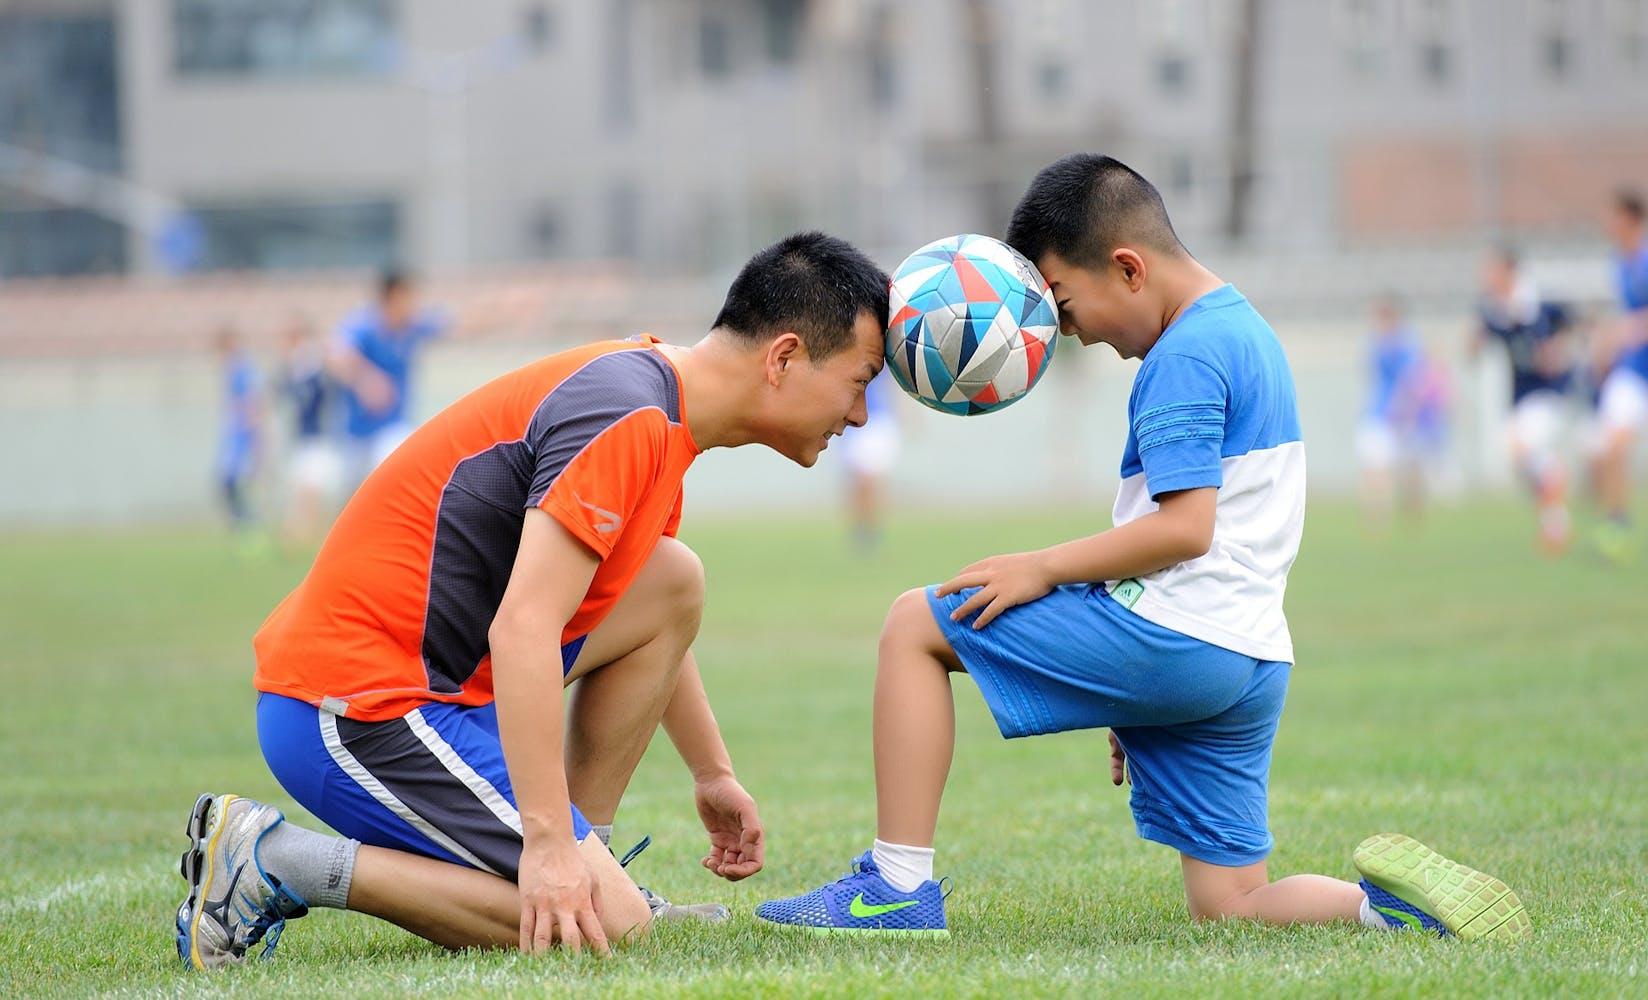 Football 1533210 1920